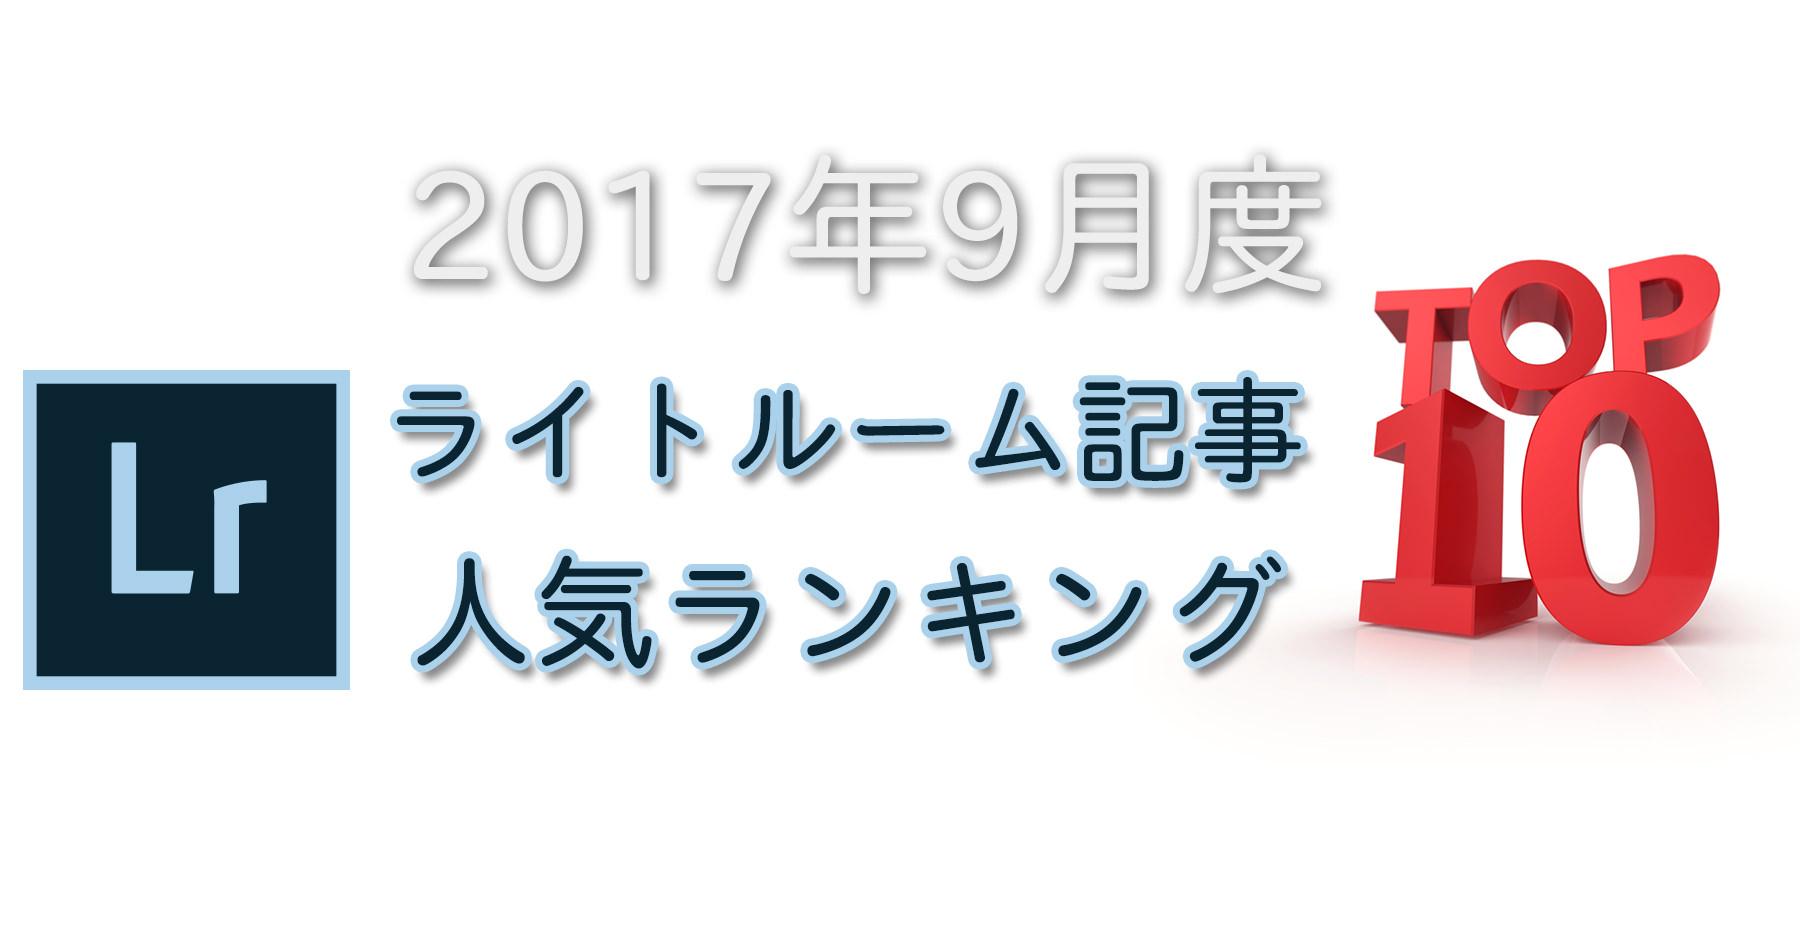 Lightroom-Ranking-2017-09-Main